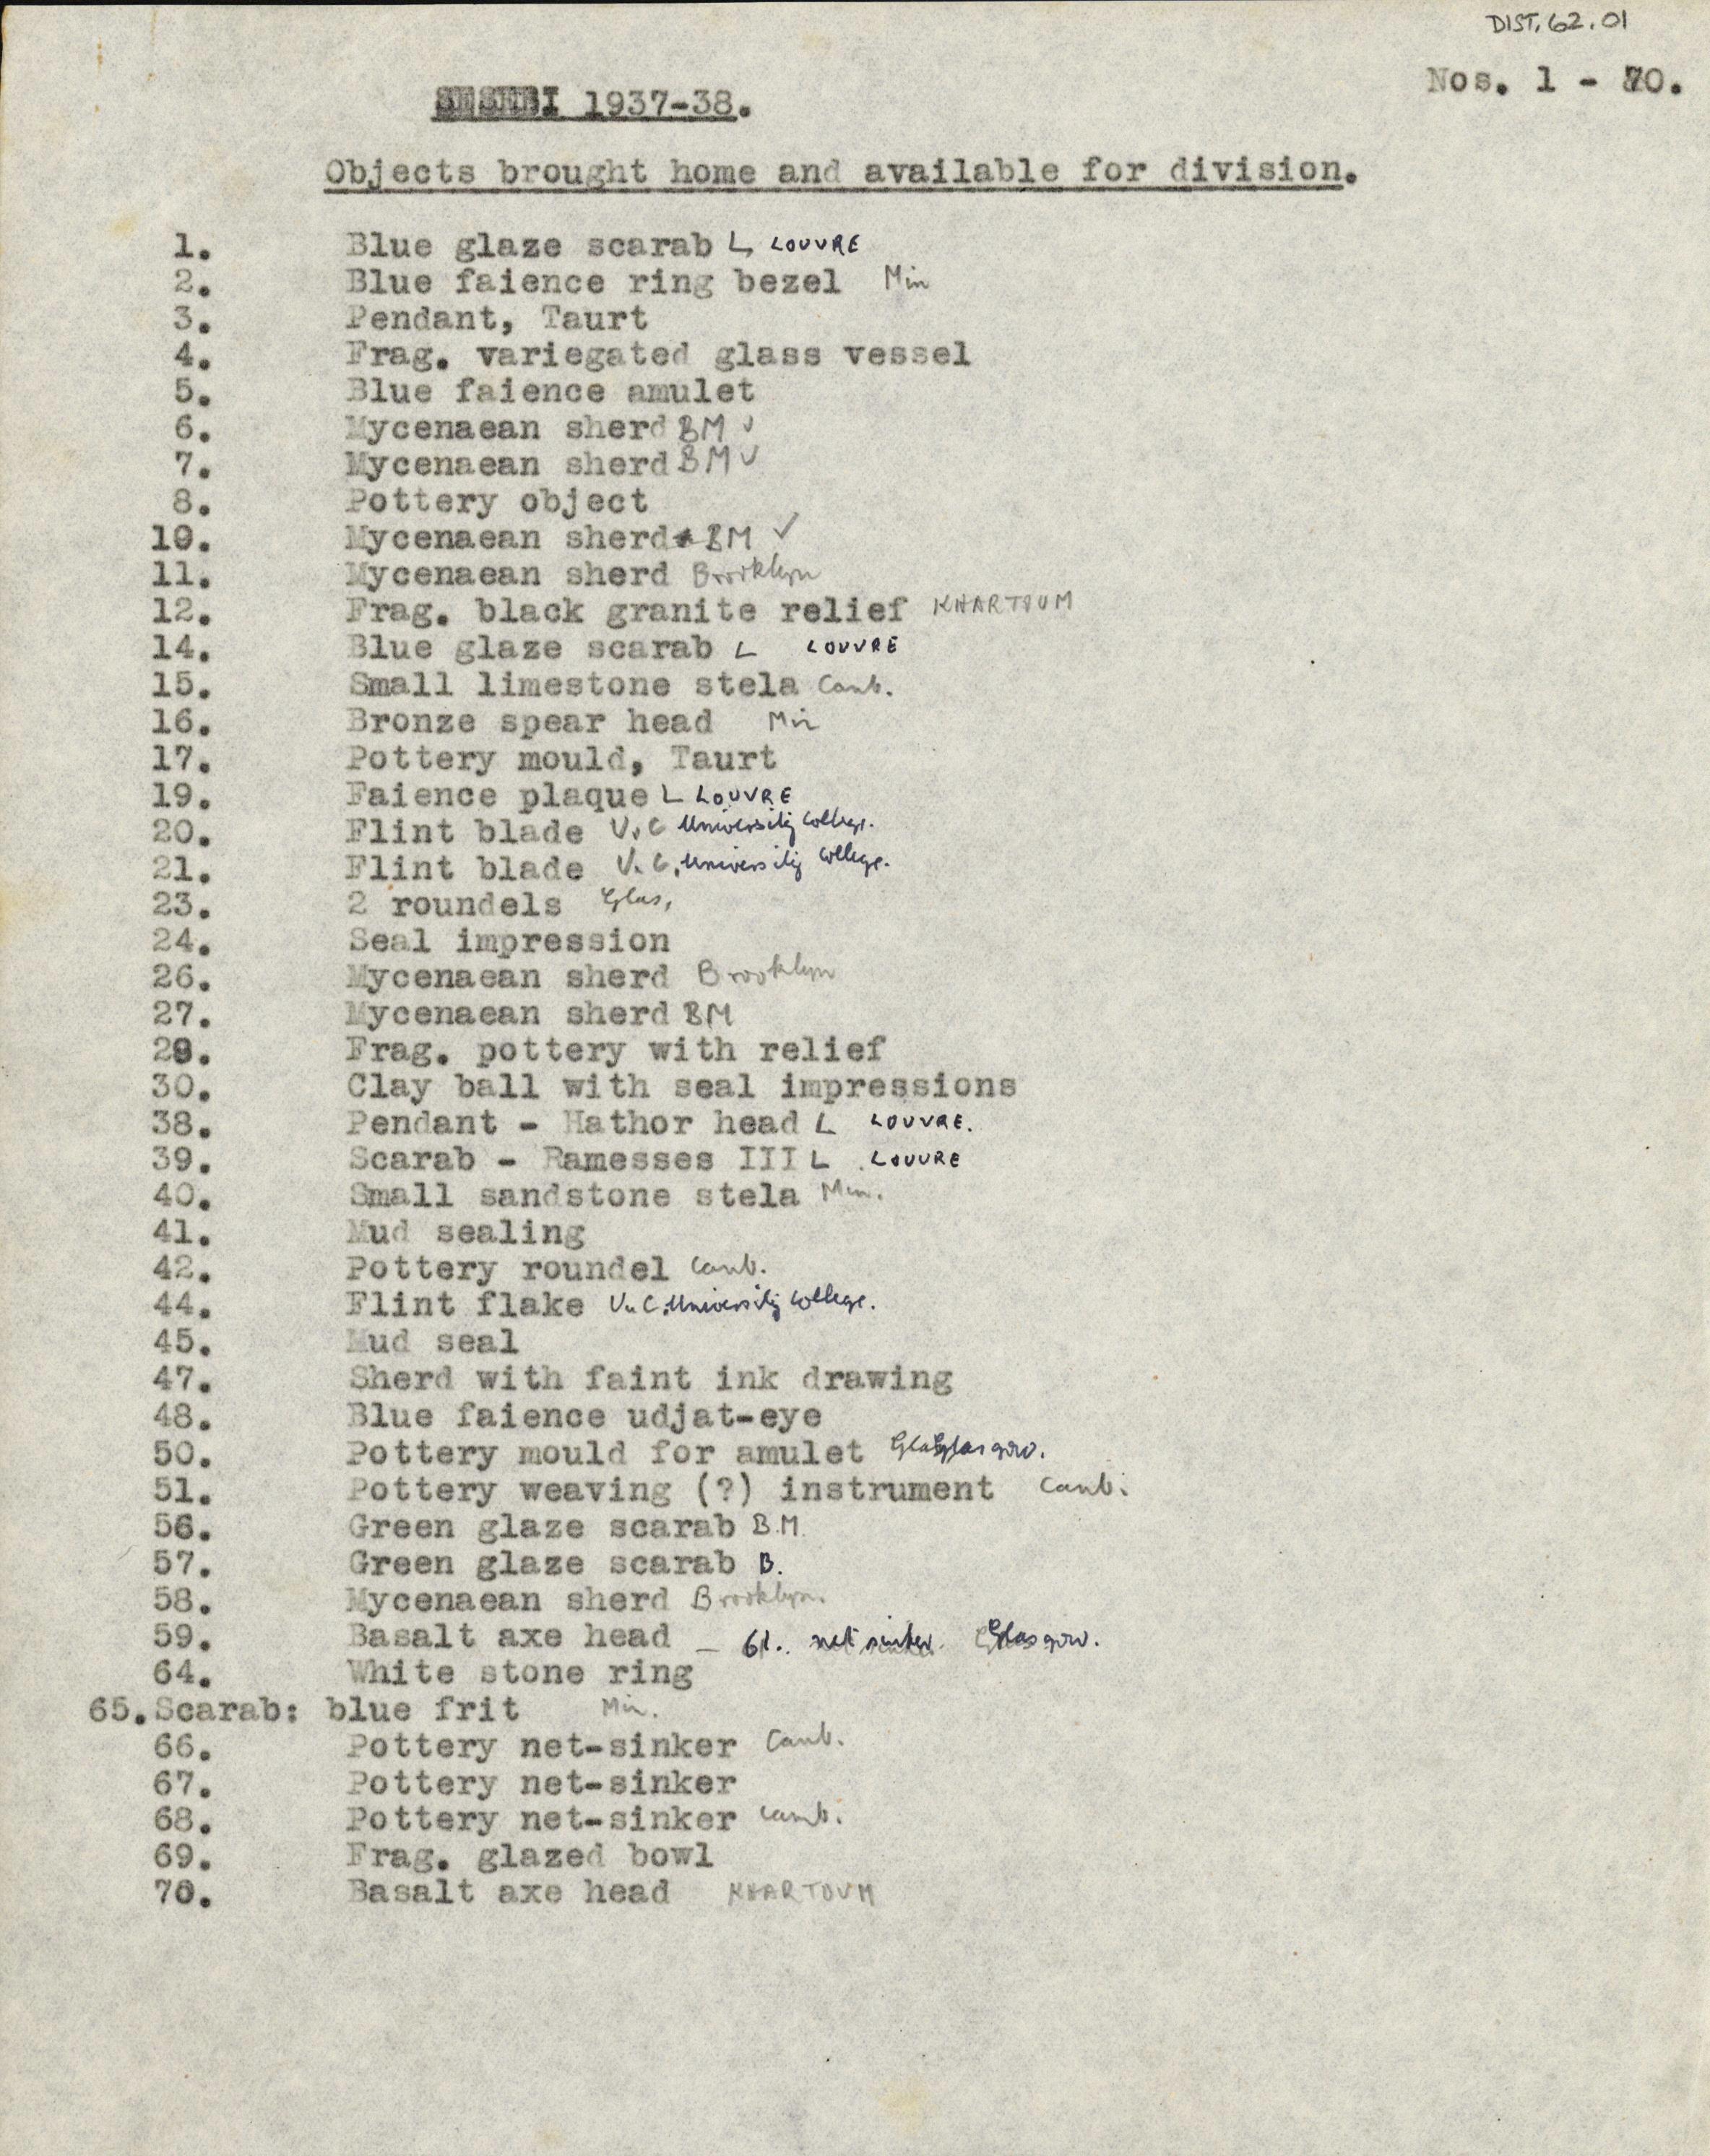 1936-38 Amarah West, Sesebi DIST.62.01a